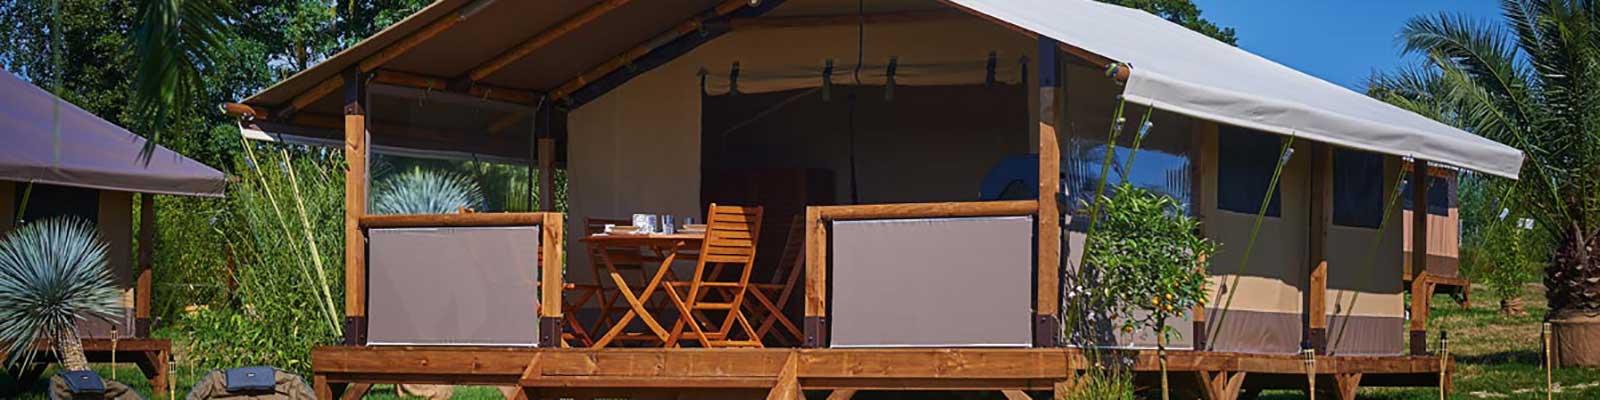 tente style kenya pour camping paca